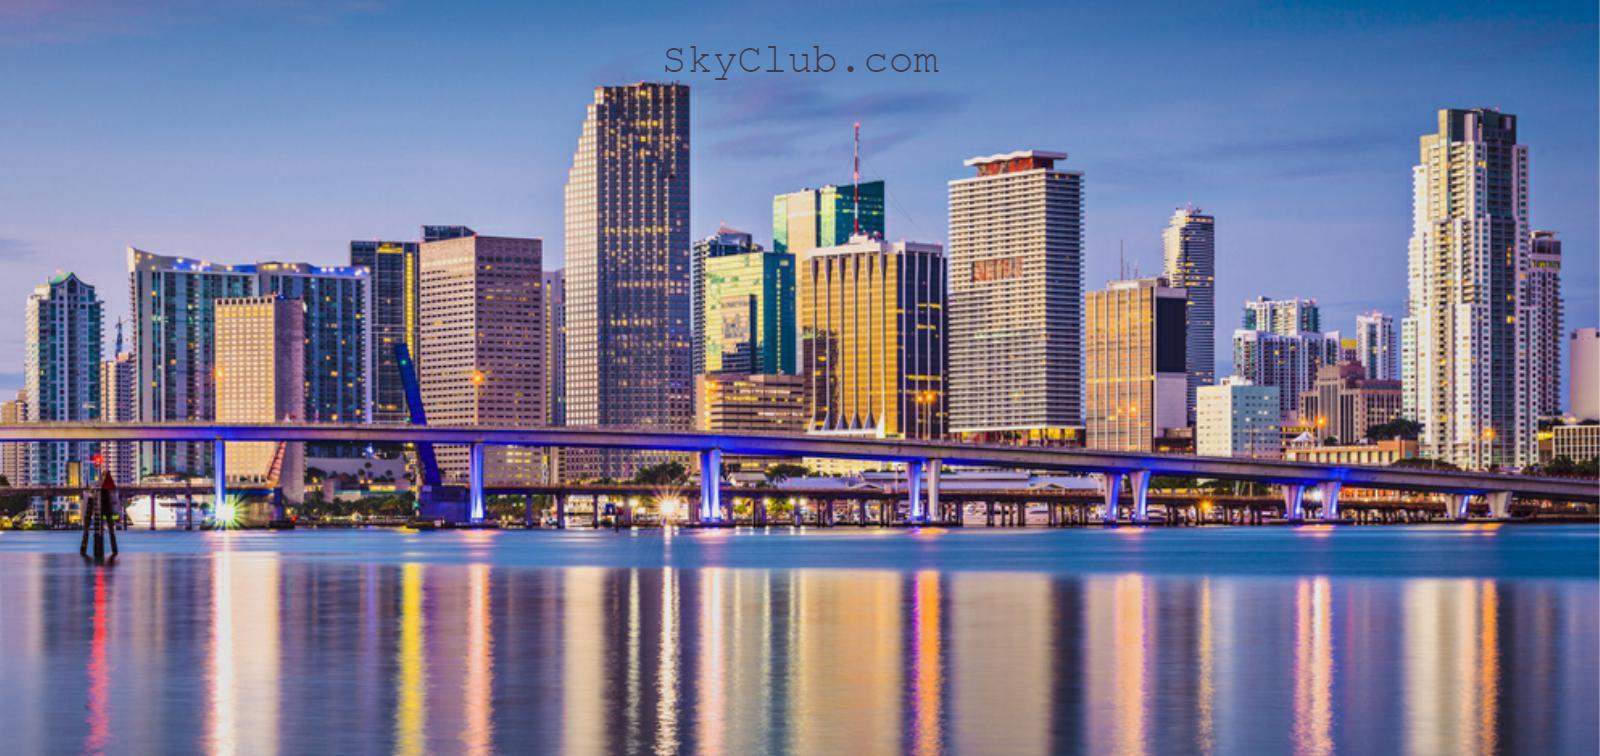 Startups: Miami's Startup Scene